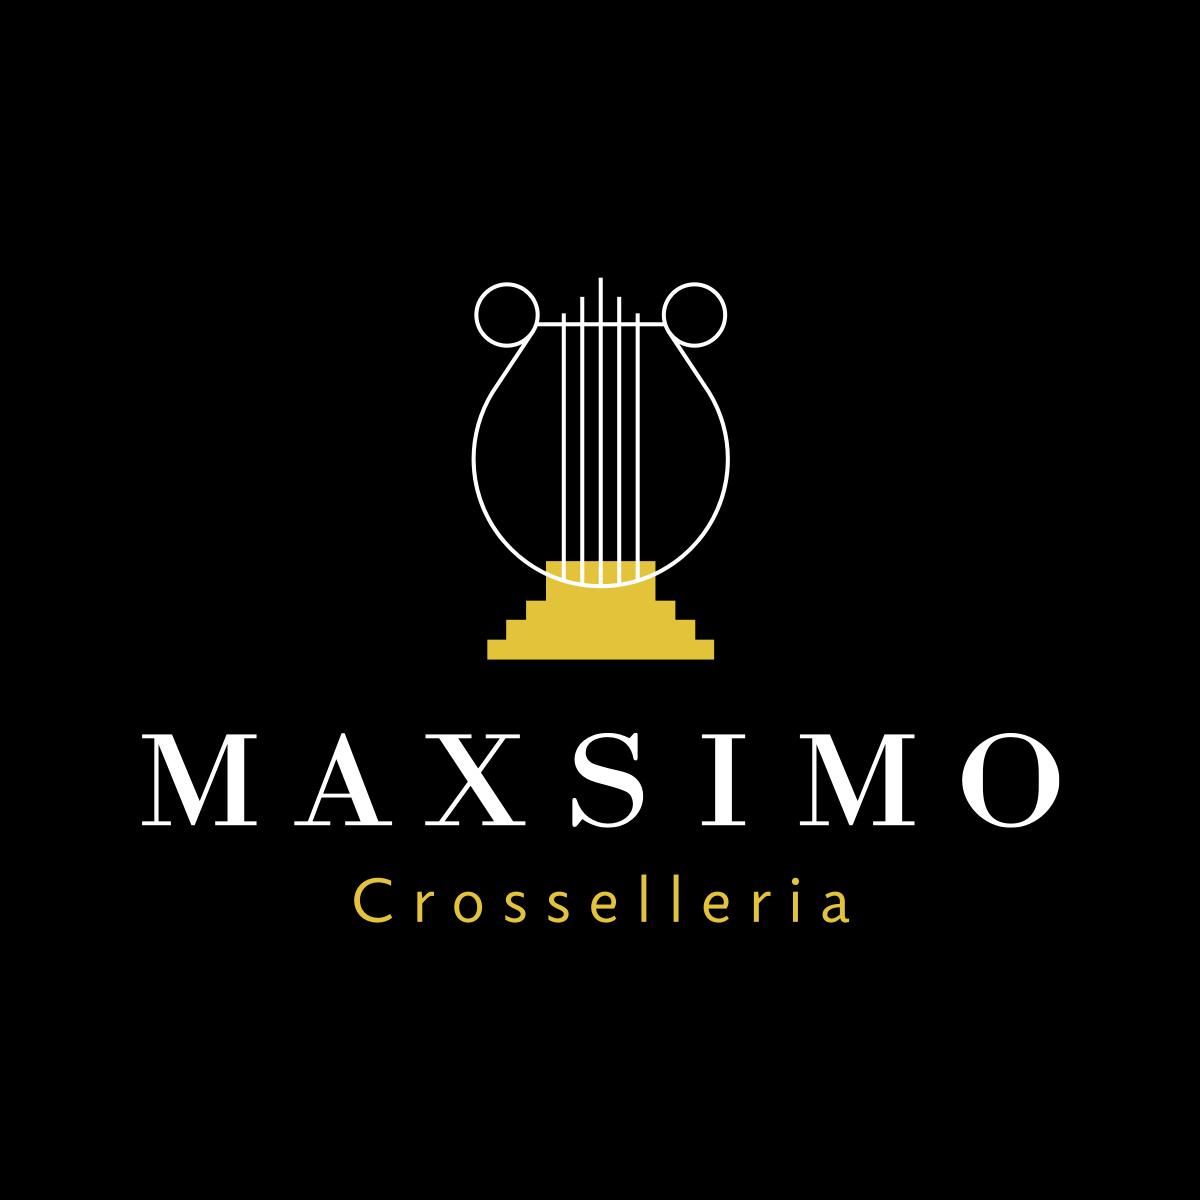 Maxsimo Crosselleria Logo